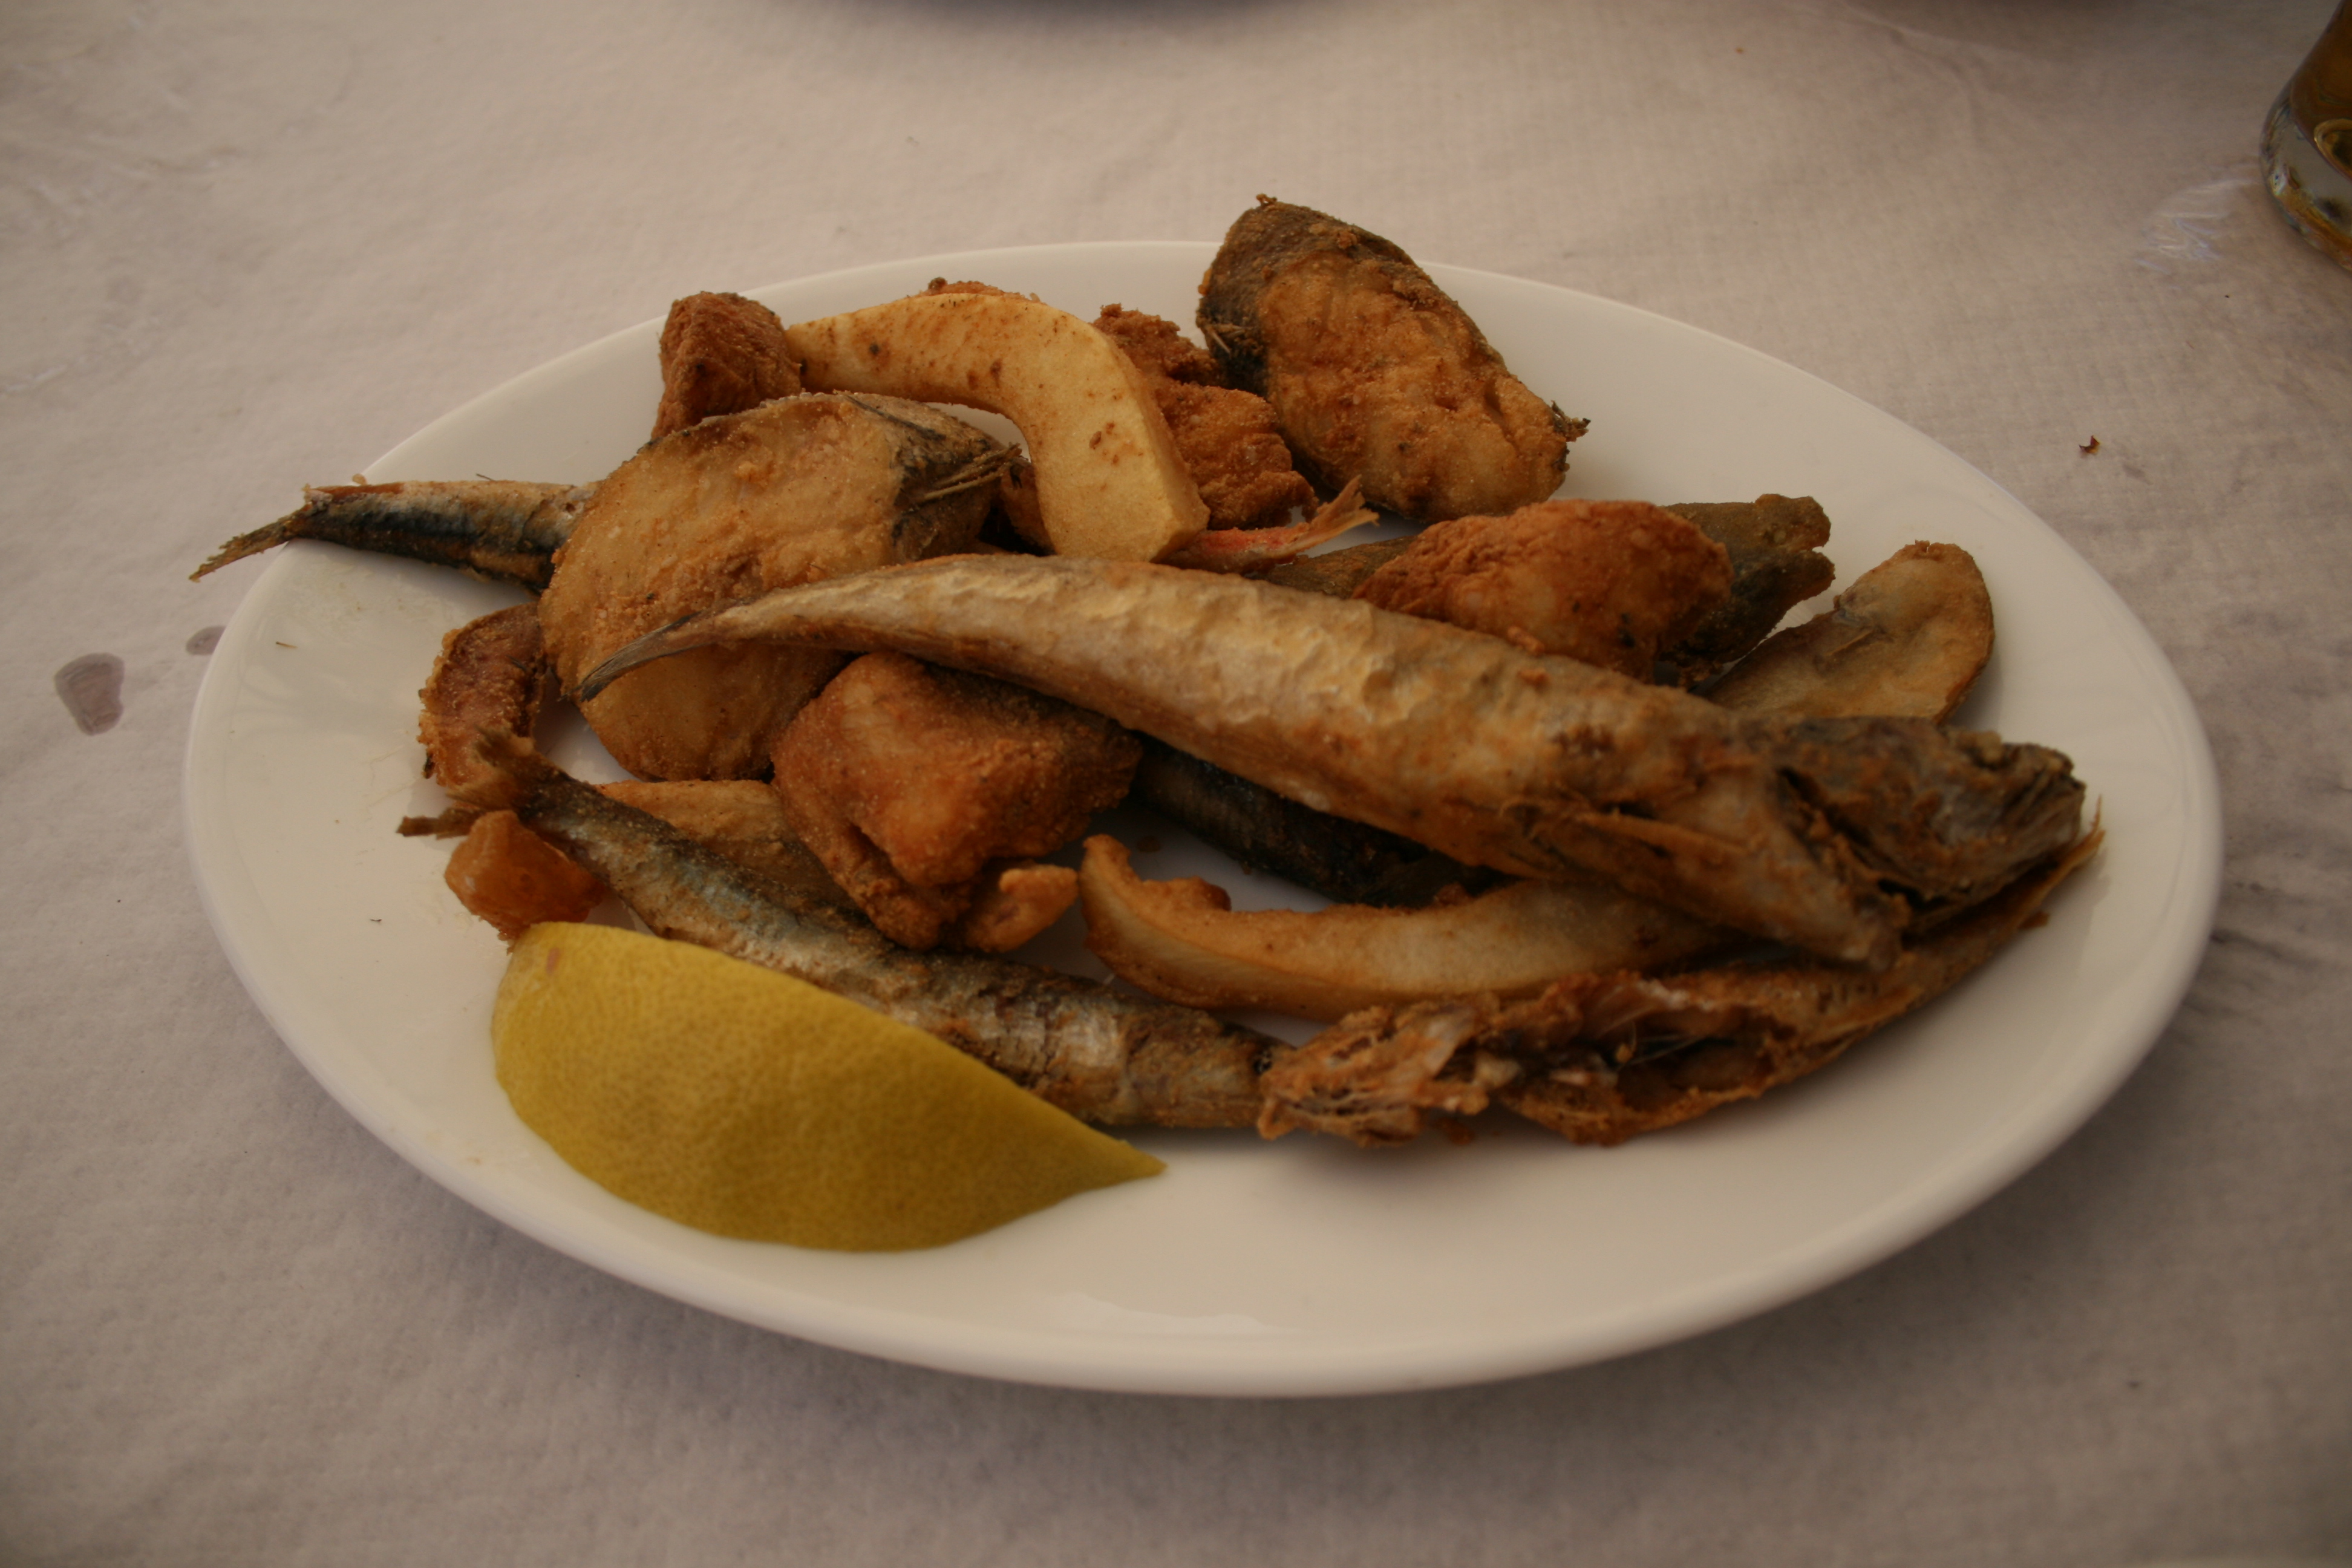 Cuisine of the Sephardic Jews